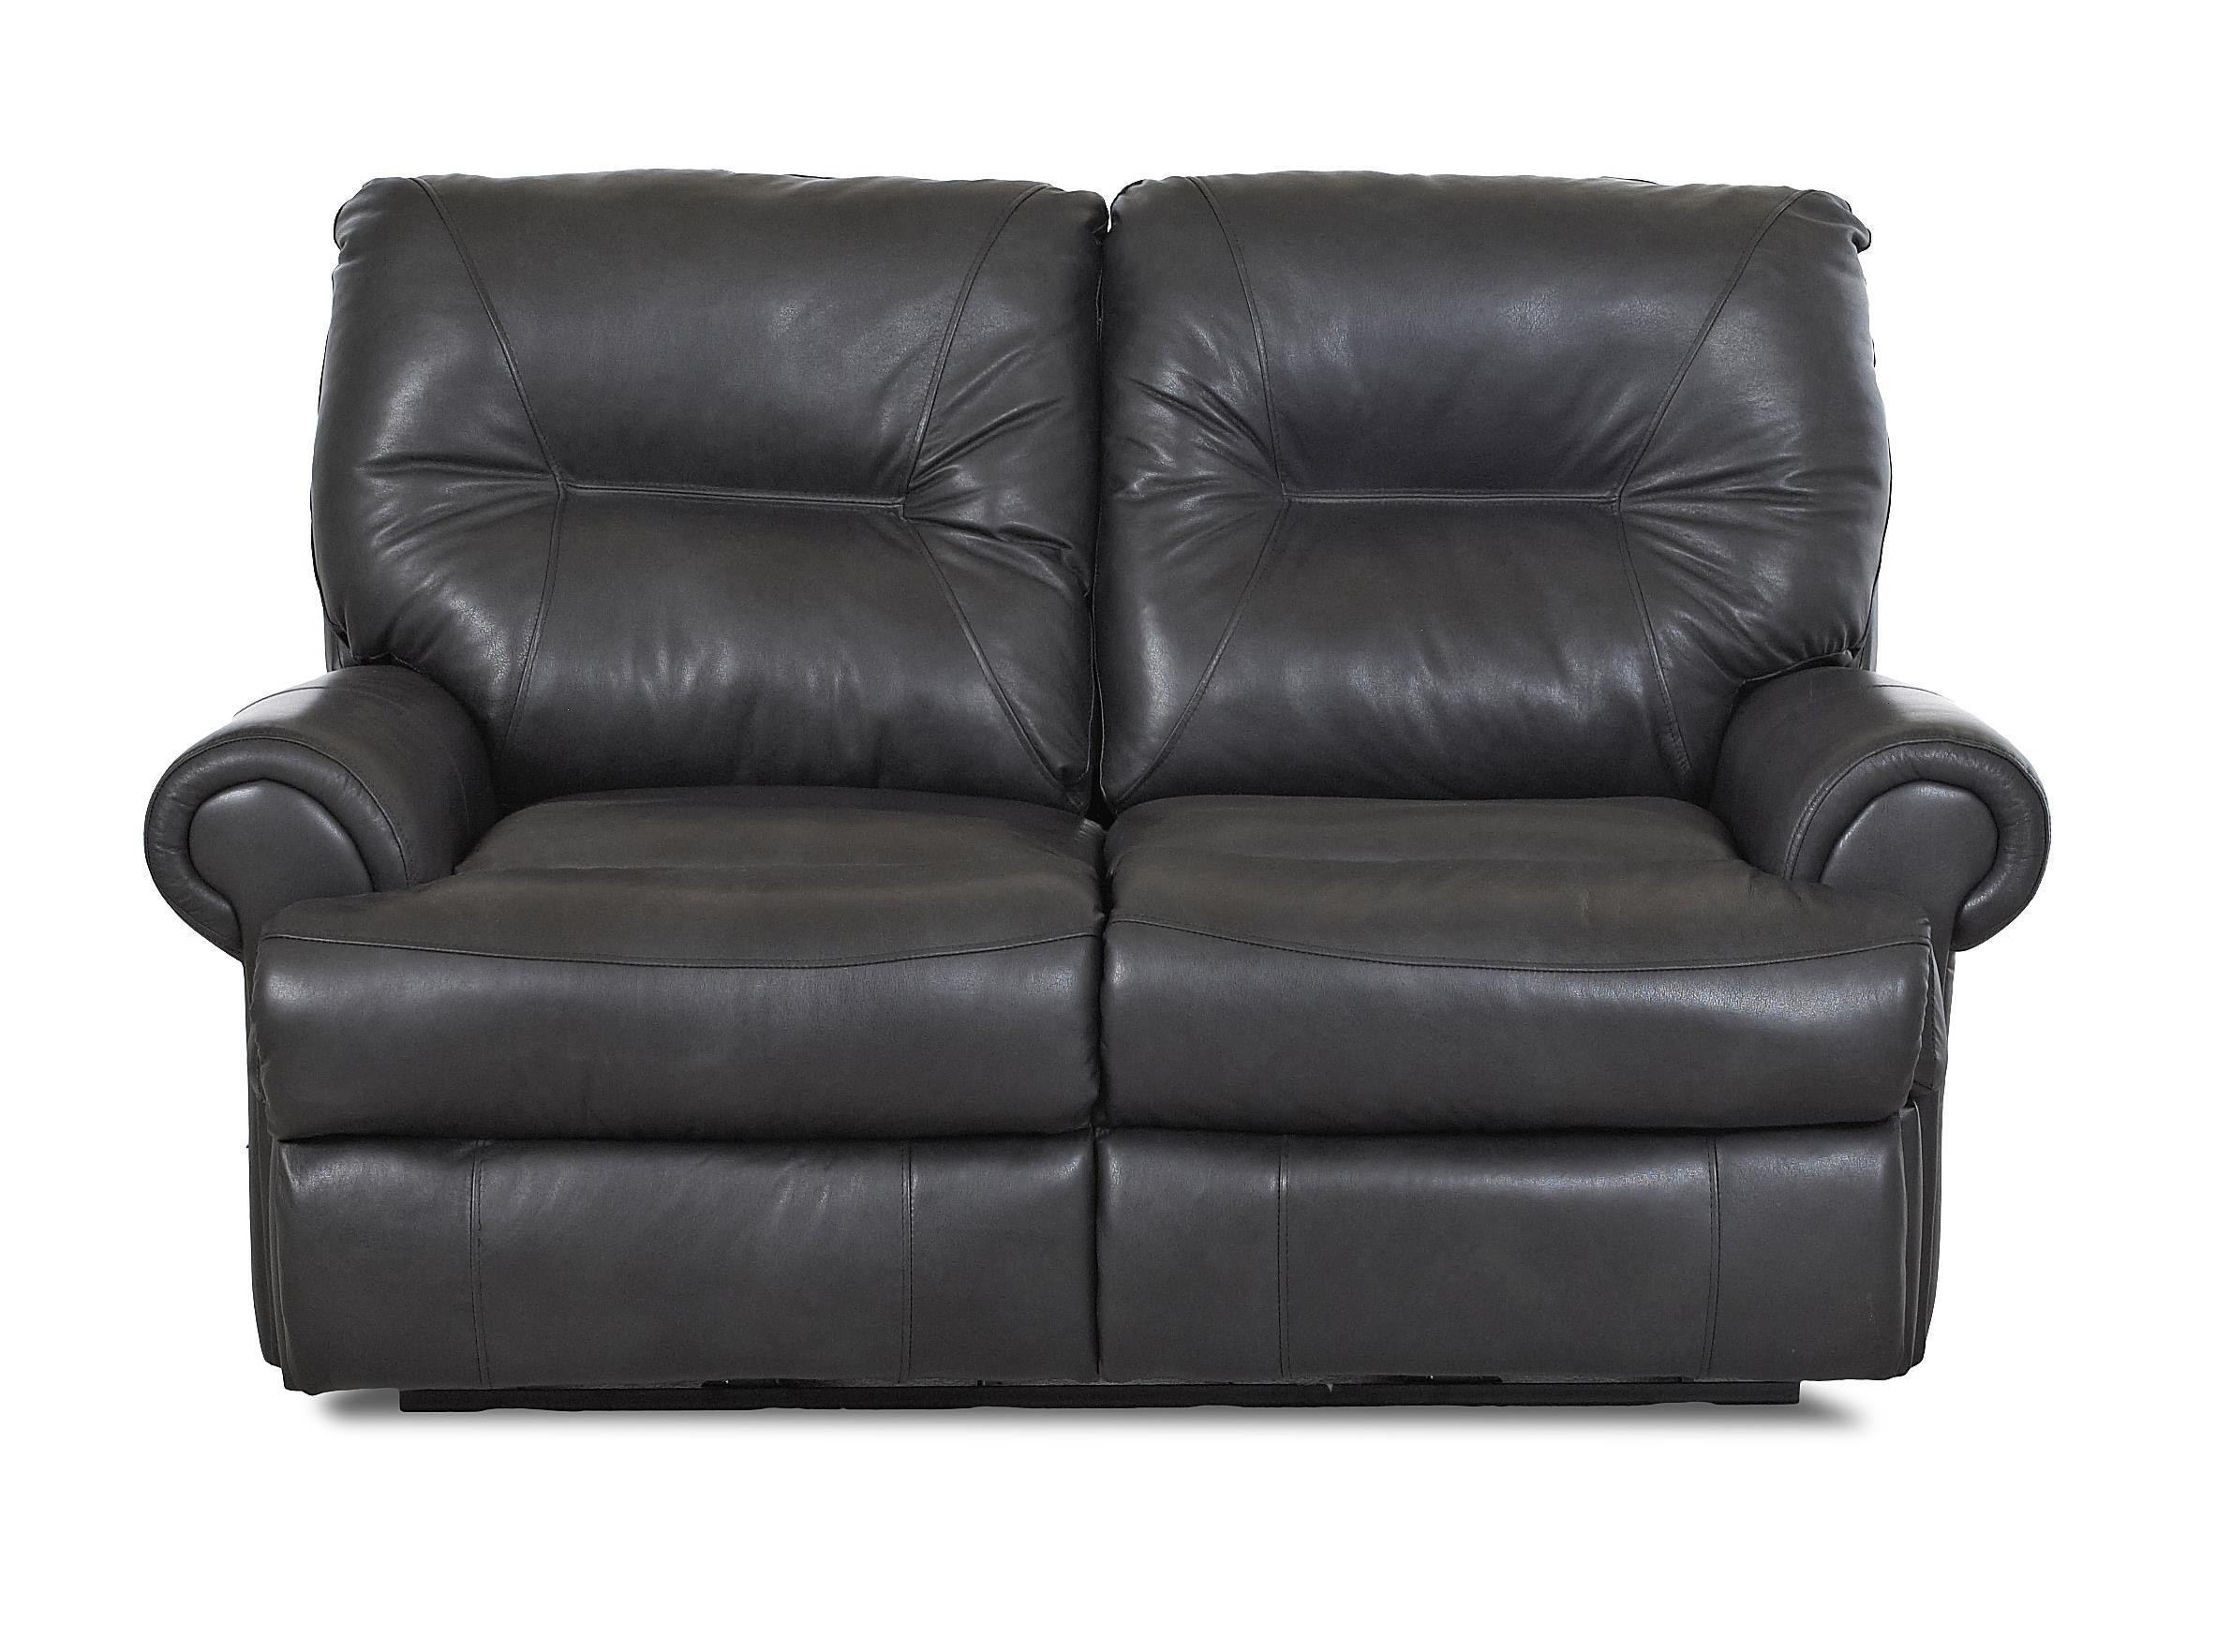 klaussner grand power reclining sofa sleeper sofas seattle roadster traditional loveseat